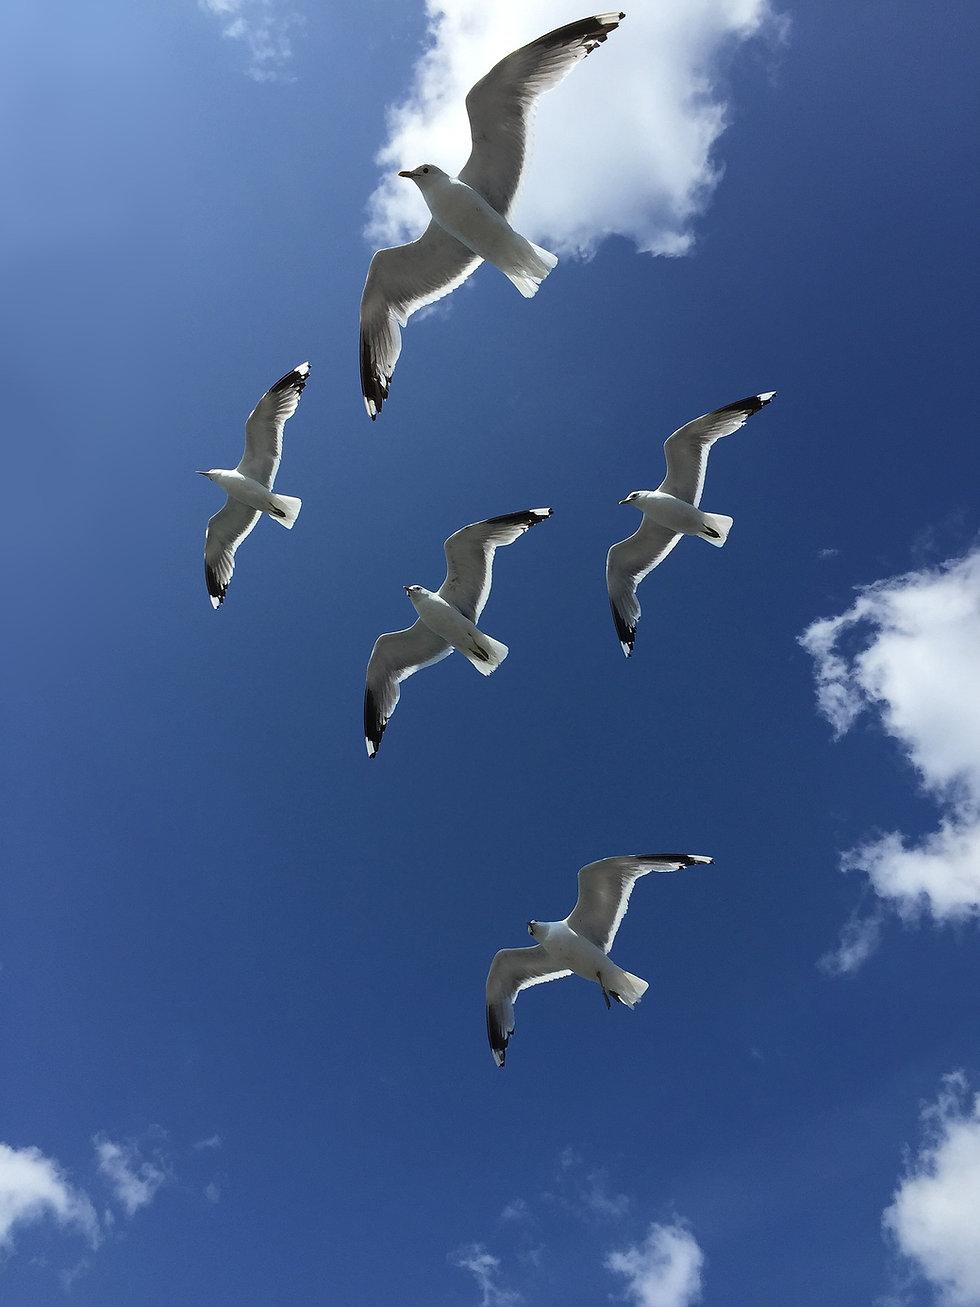 seagulls-1272916_1920 lokit pixabay.jpg